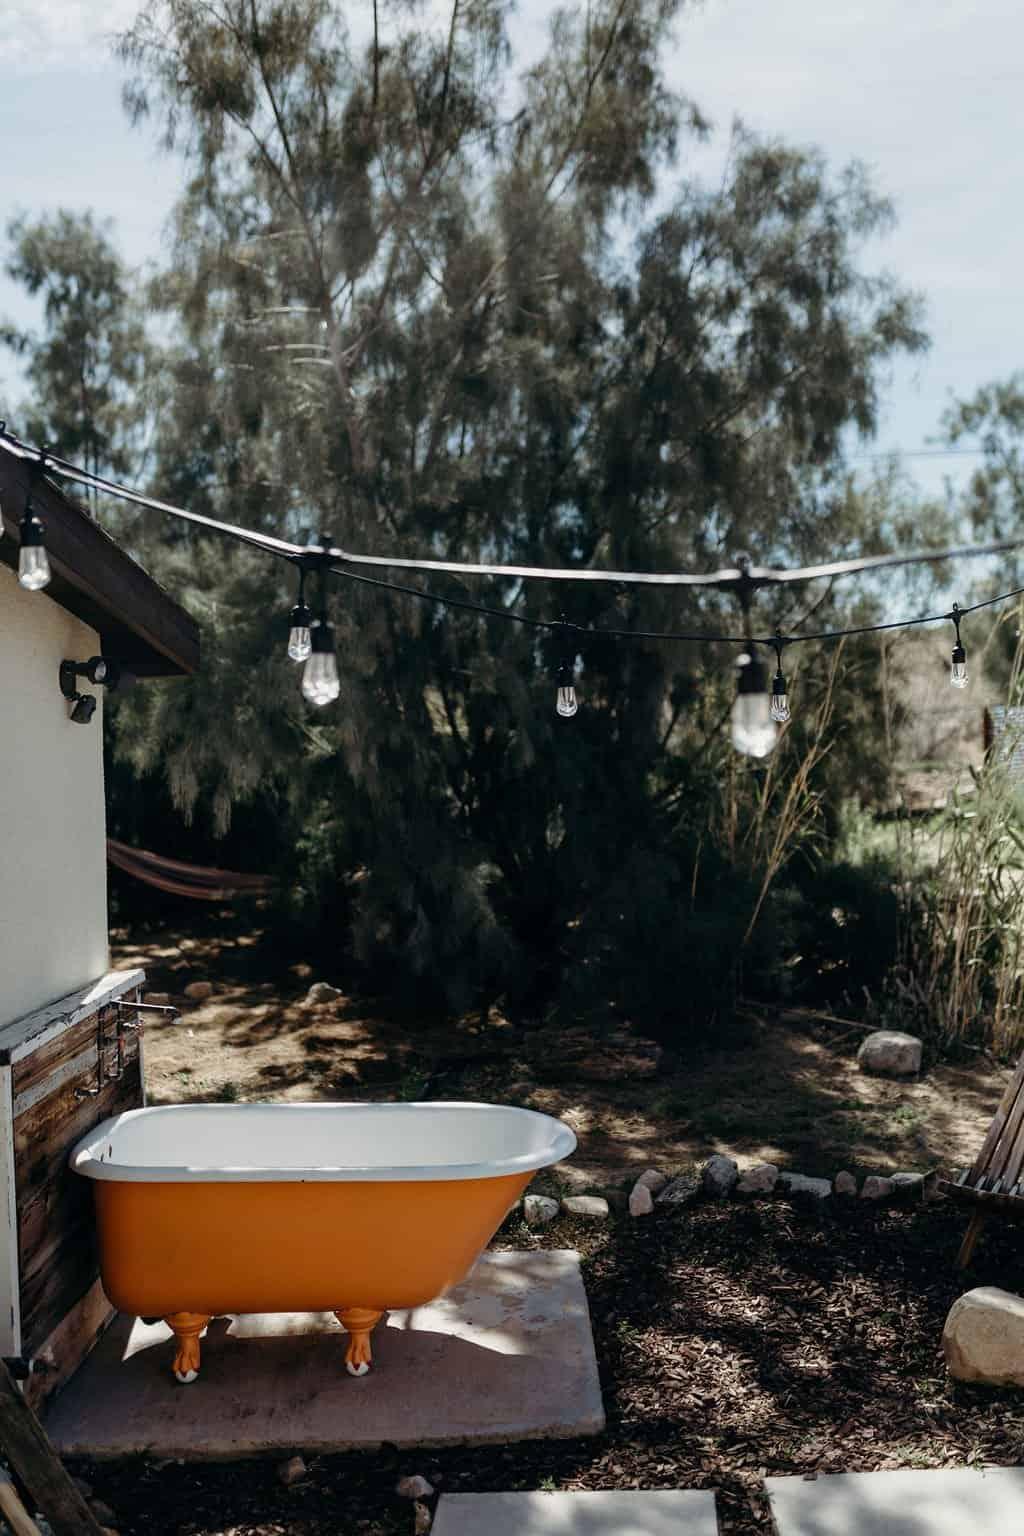 Orange clawfoot tub outside a Joshua Tree airbnb